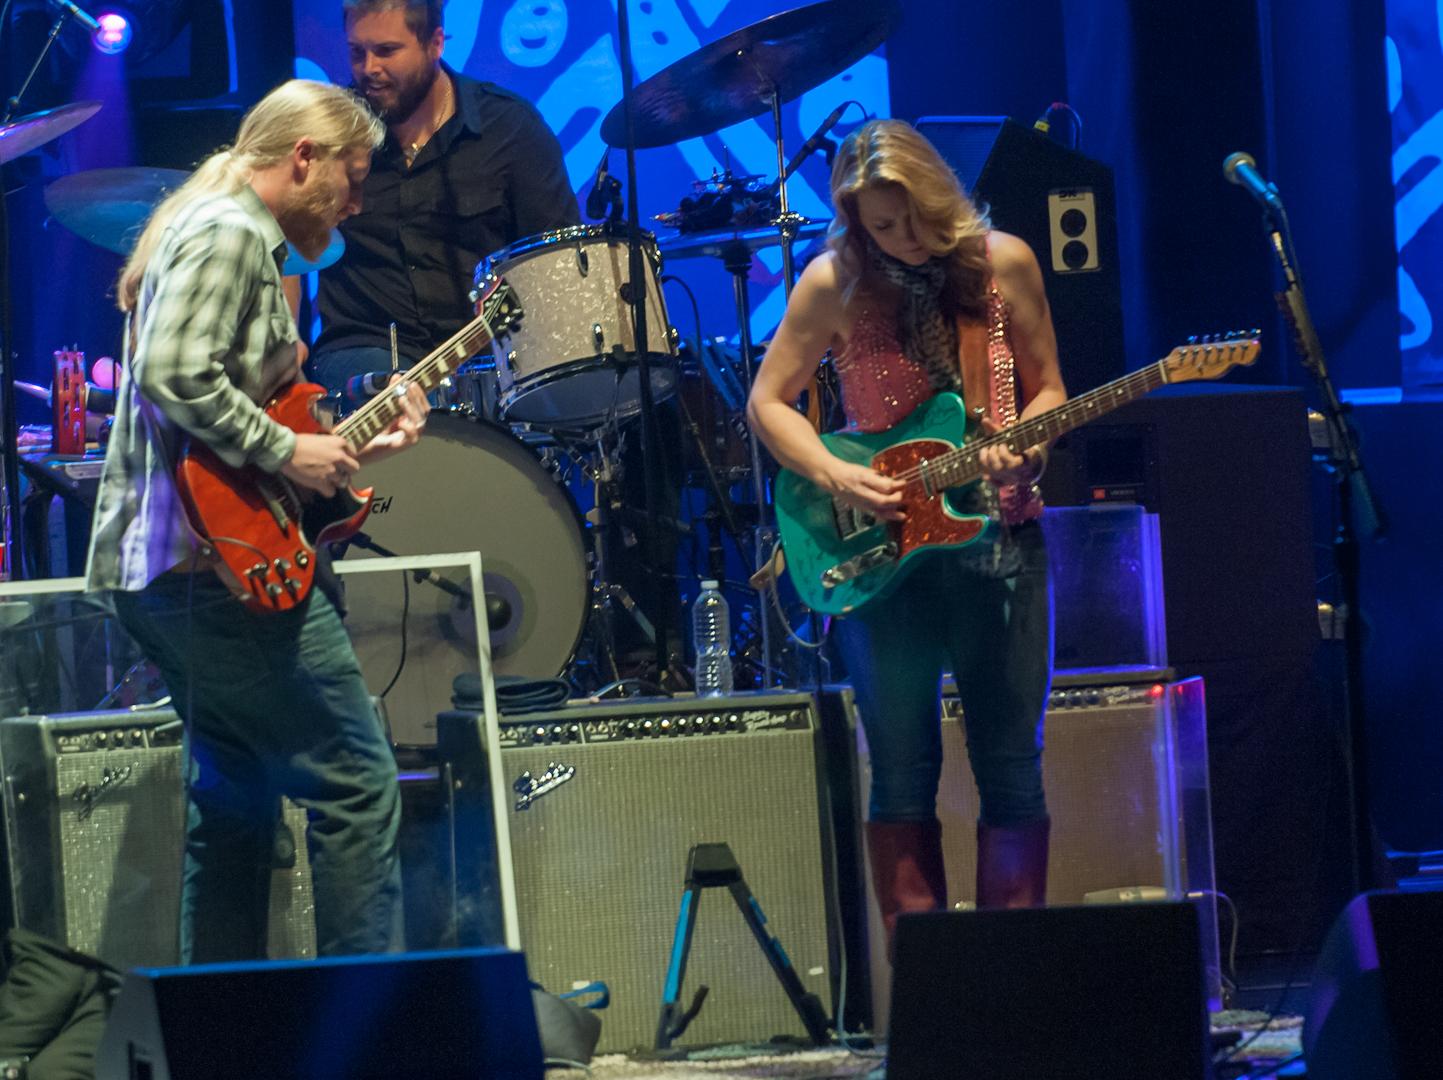 Derek Trucks, Susan Tedeschi and Tyler Greenwell with the Tedeschi Trucks Band at the Beacon